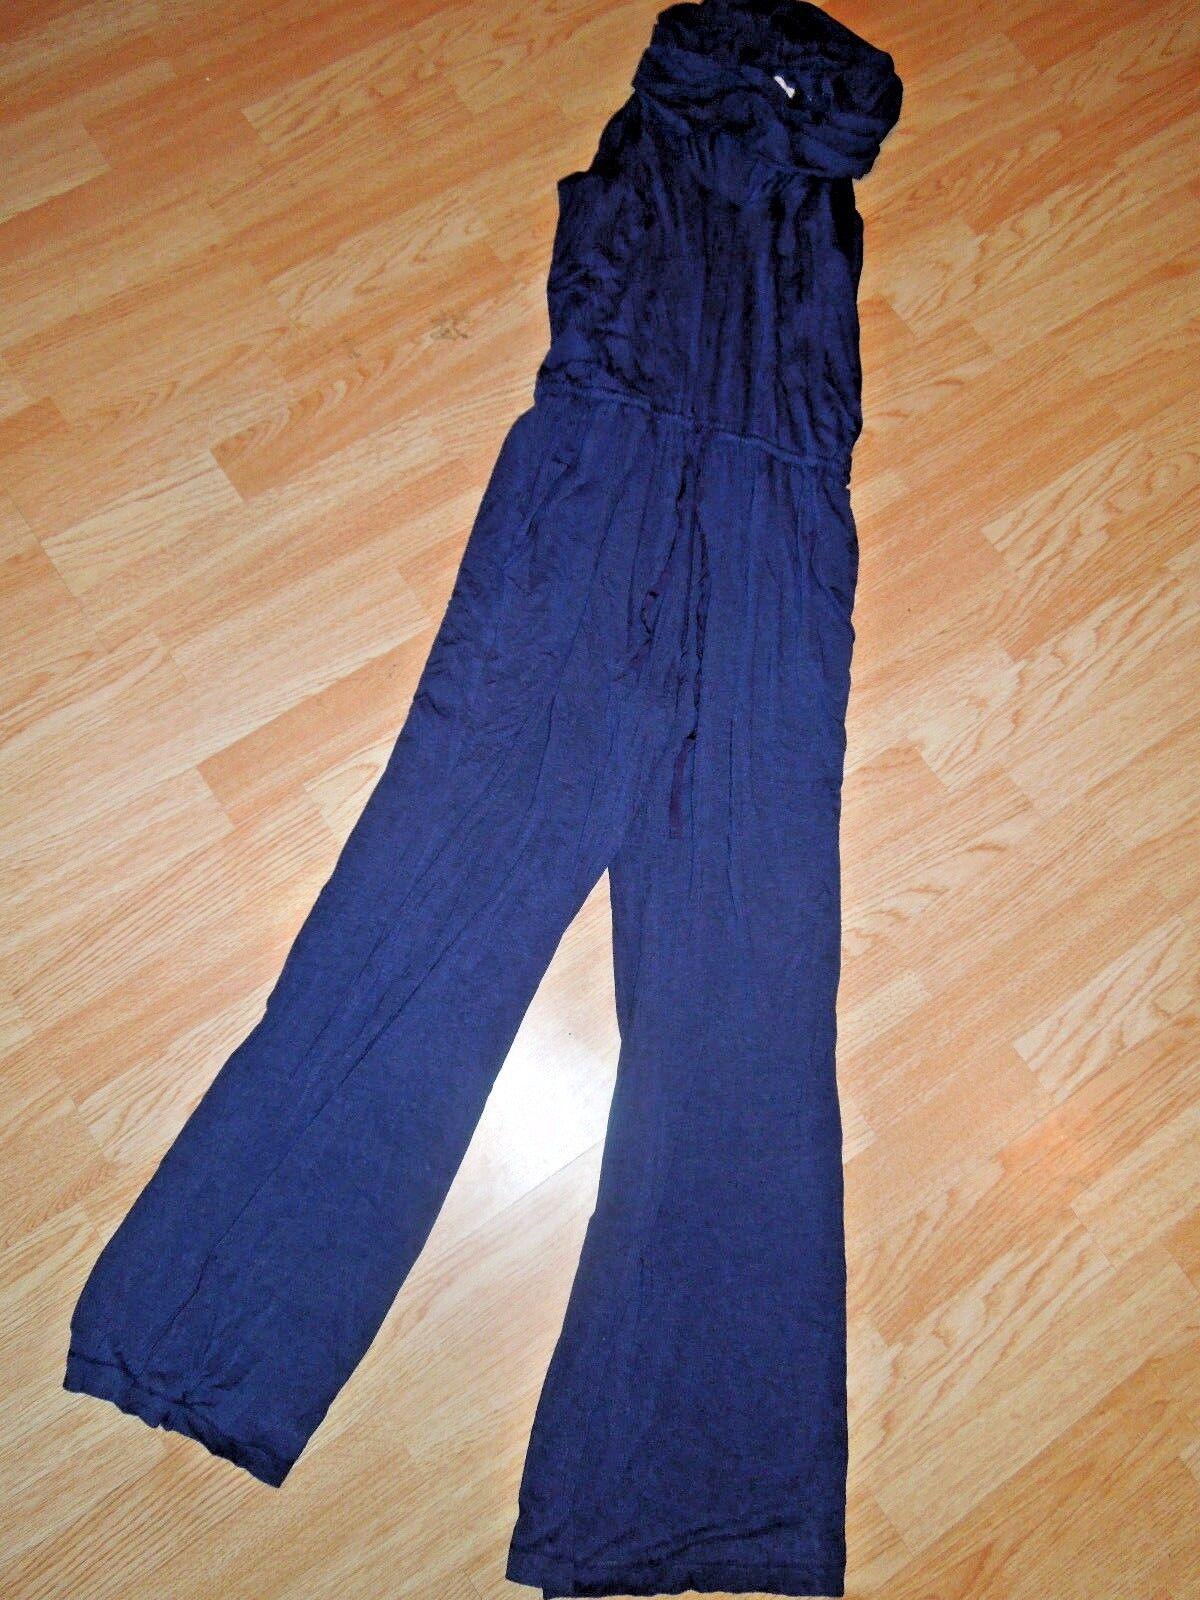 MAX STUDIO Romp Around ROMPER shirt PANTS  one piece  SMALL S  bluee